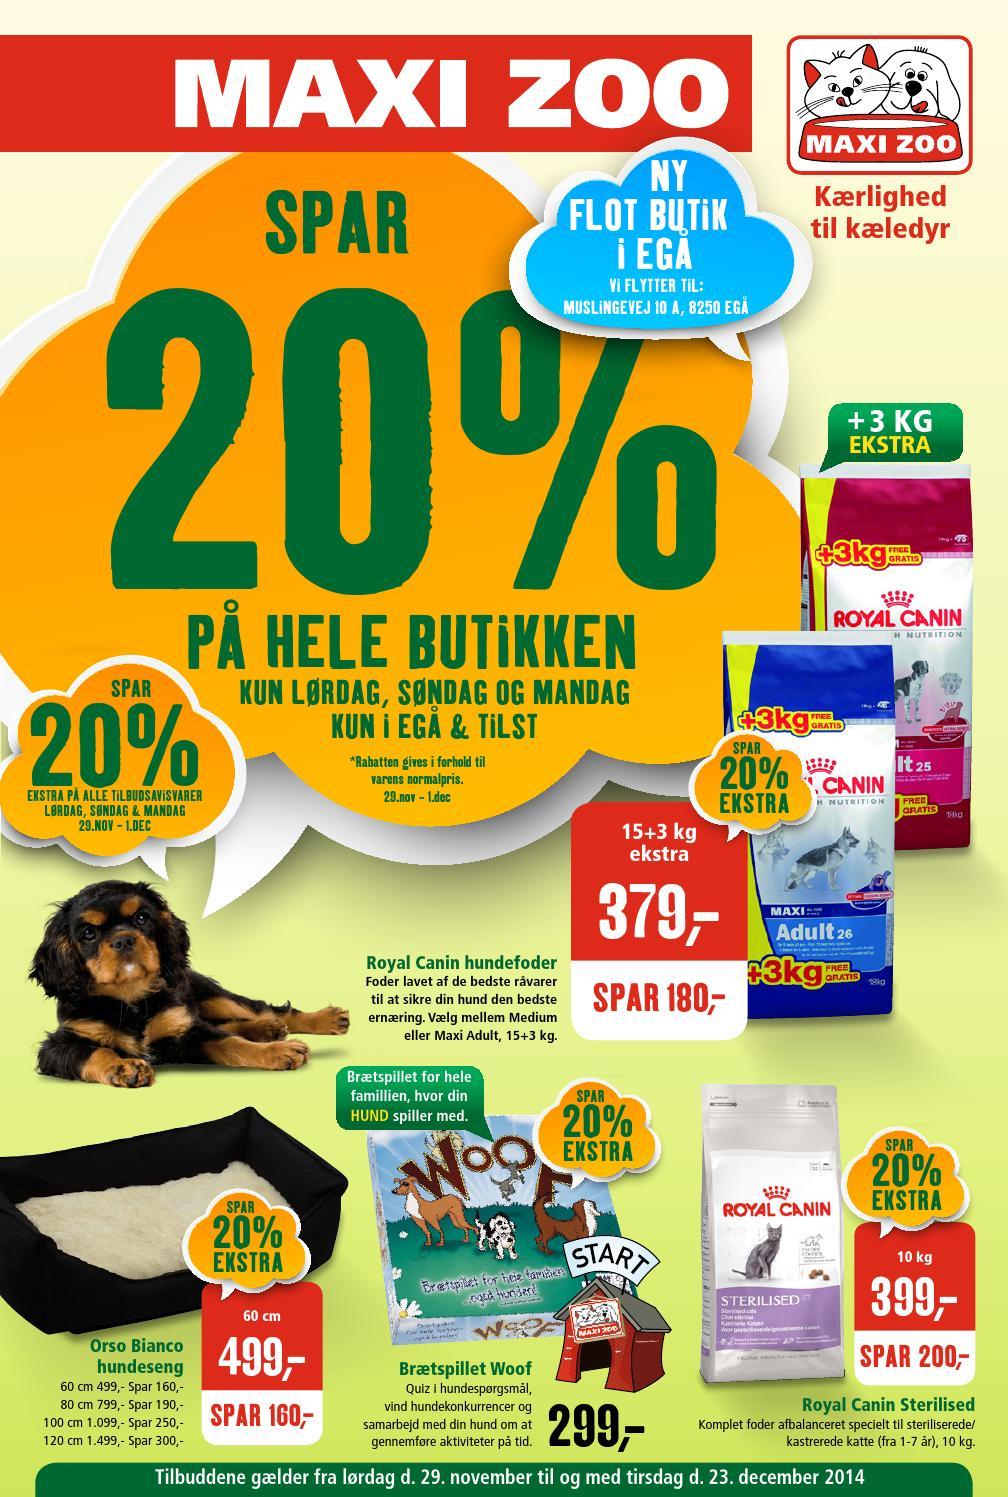 Picture of: Maxizoo Tilbudsavis Uge 49 Ega Og Tilst By Maxi Zoo Danmark A S Issuu